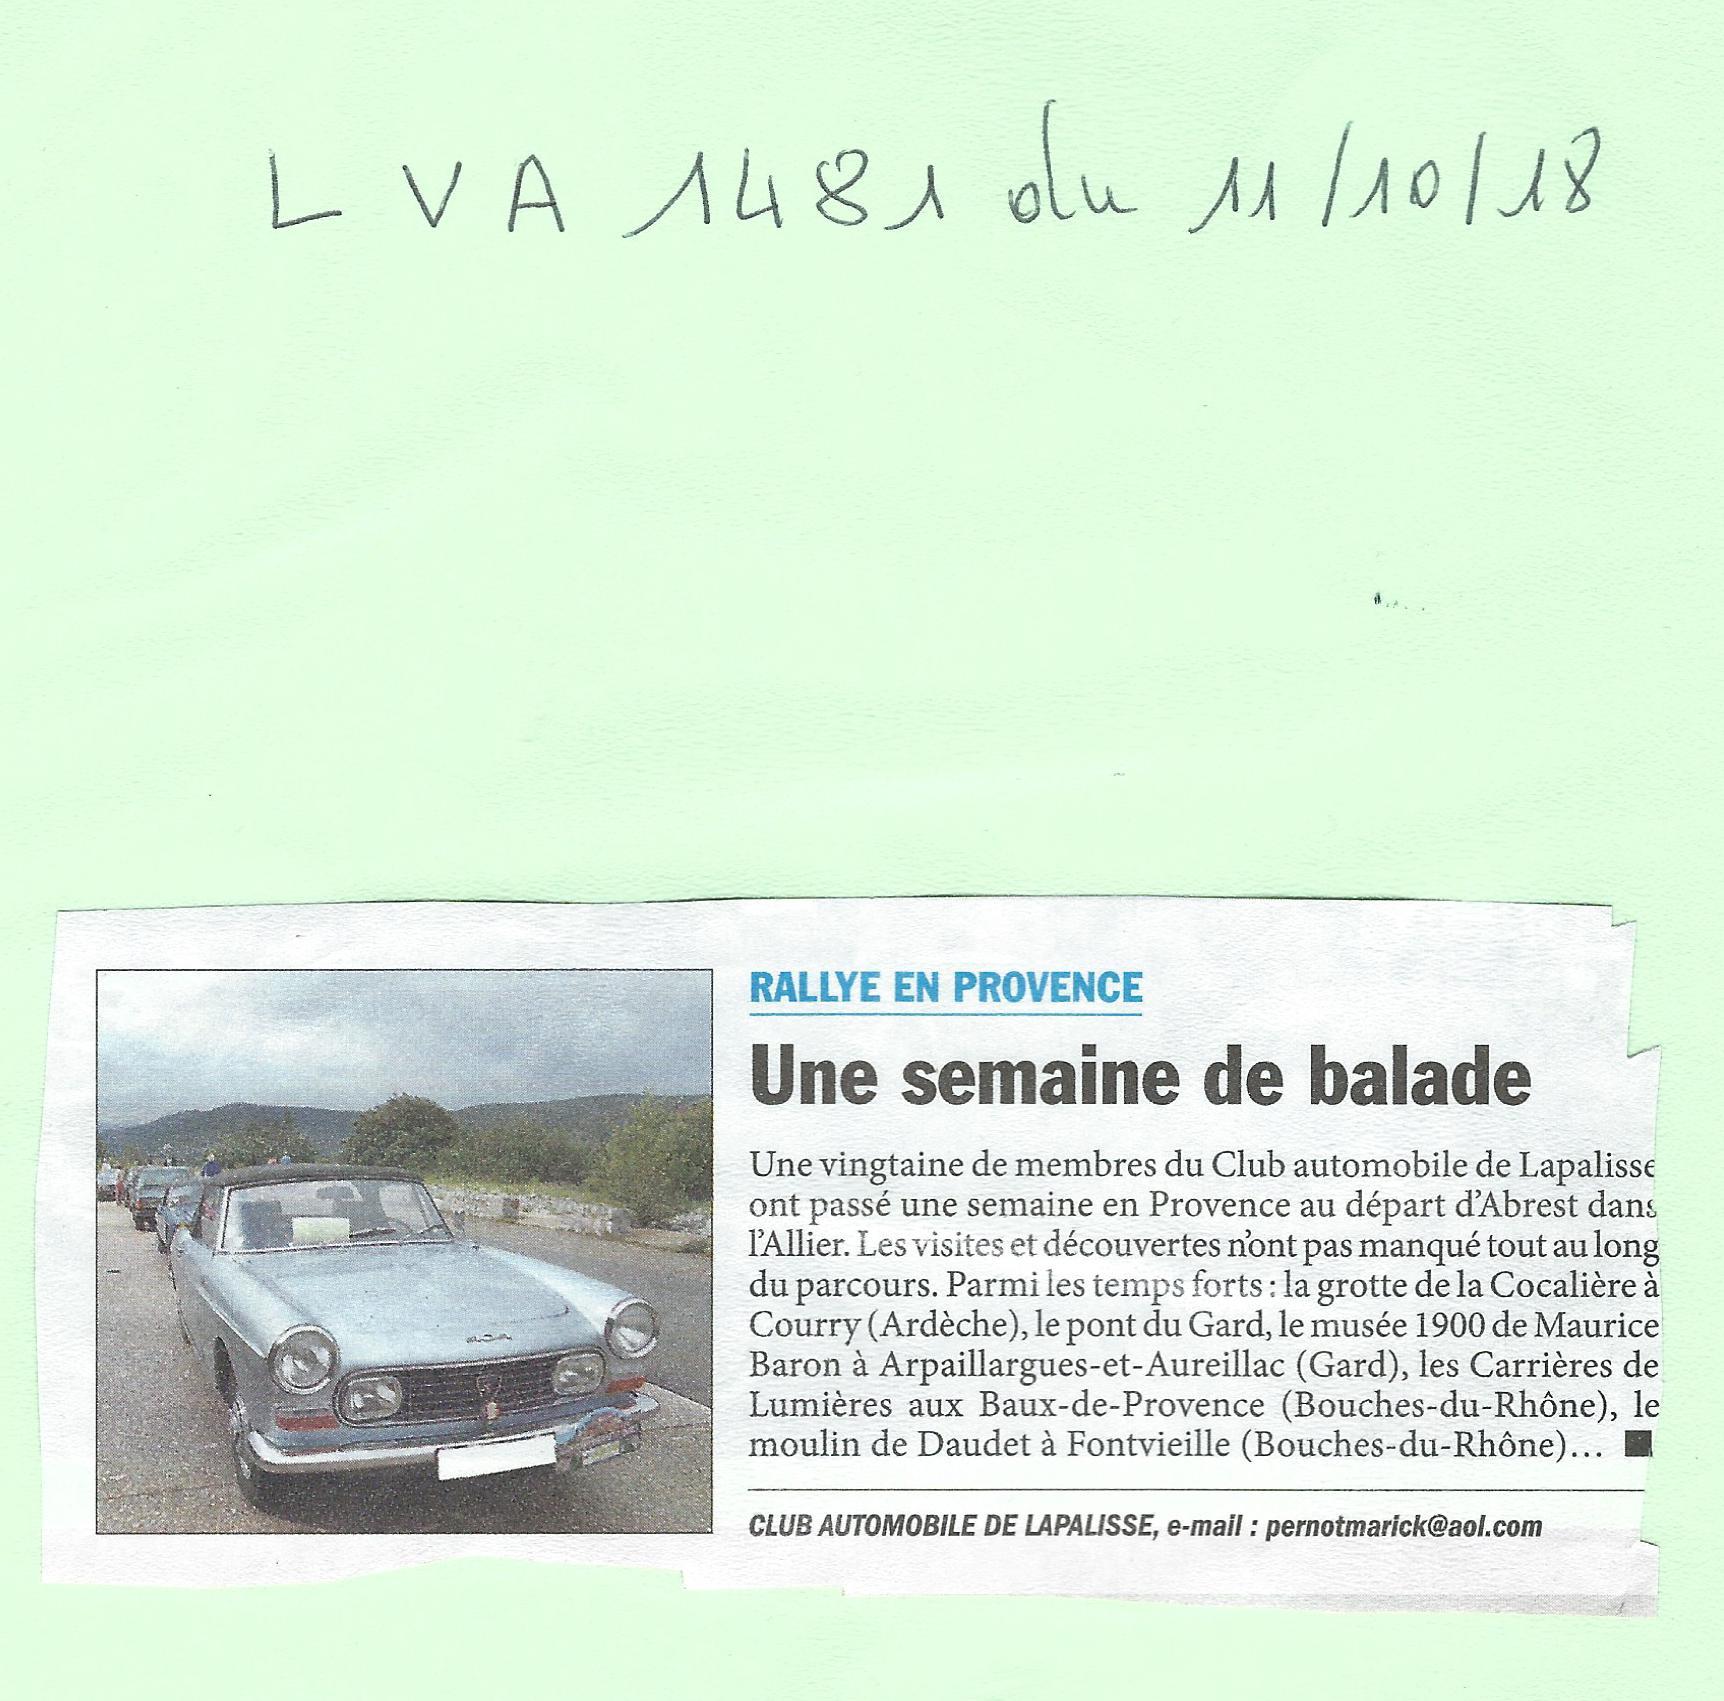 Balade en Provence - article dans LVA